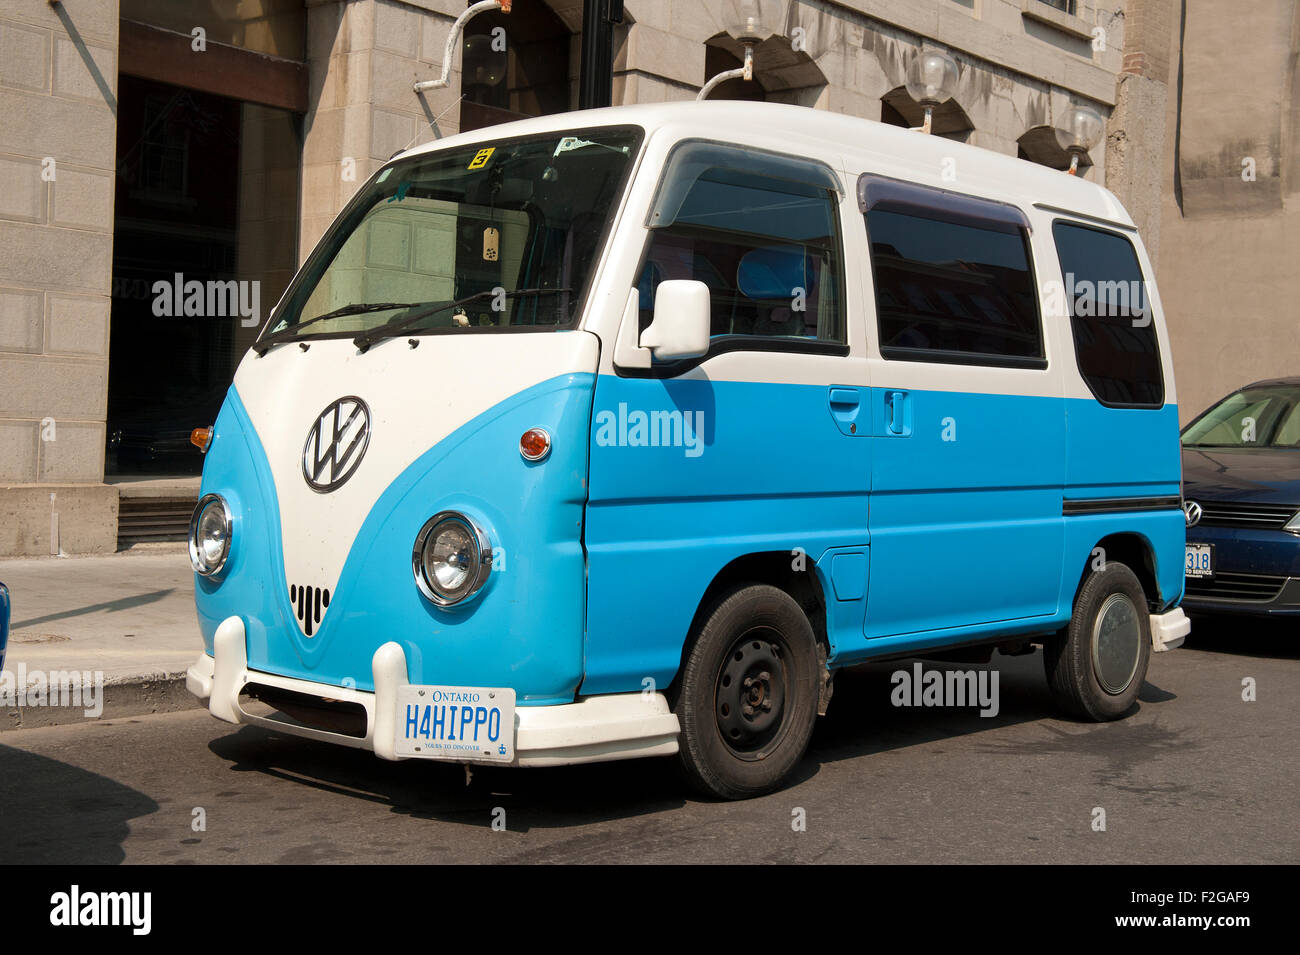 Volkswagen type 1 van parked on a street of Kingston, Ontario, Canada. - Stock Image